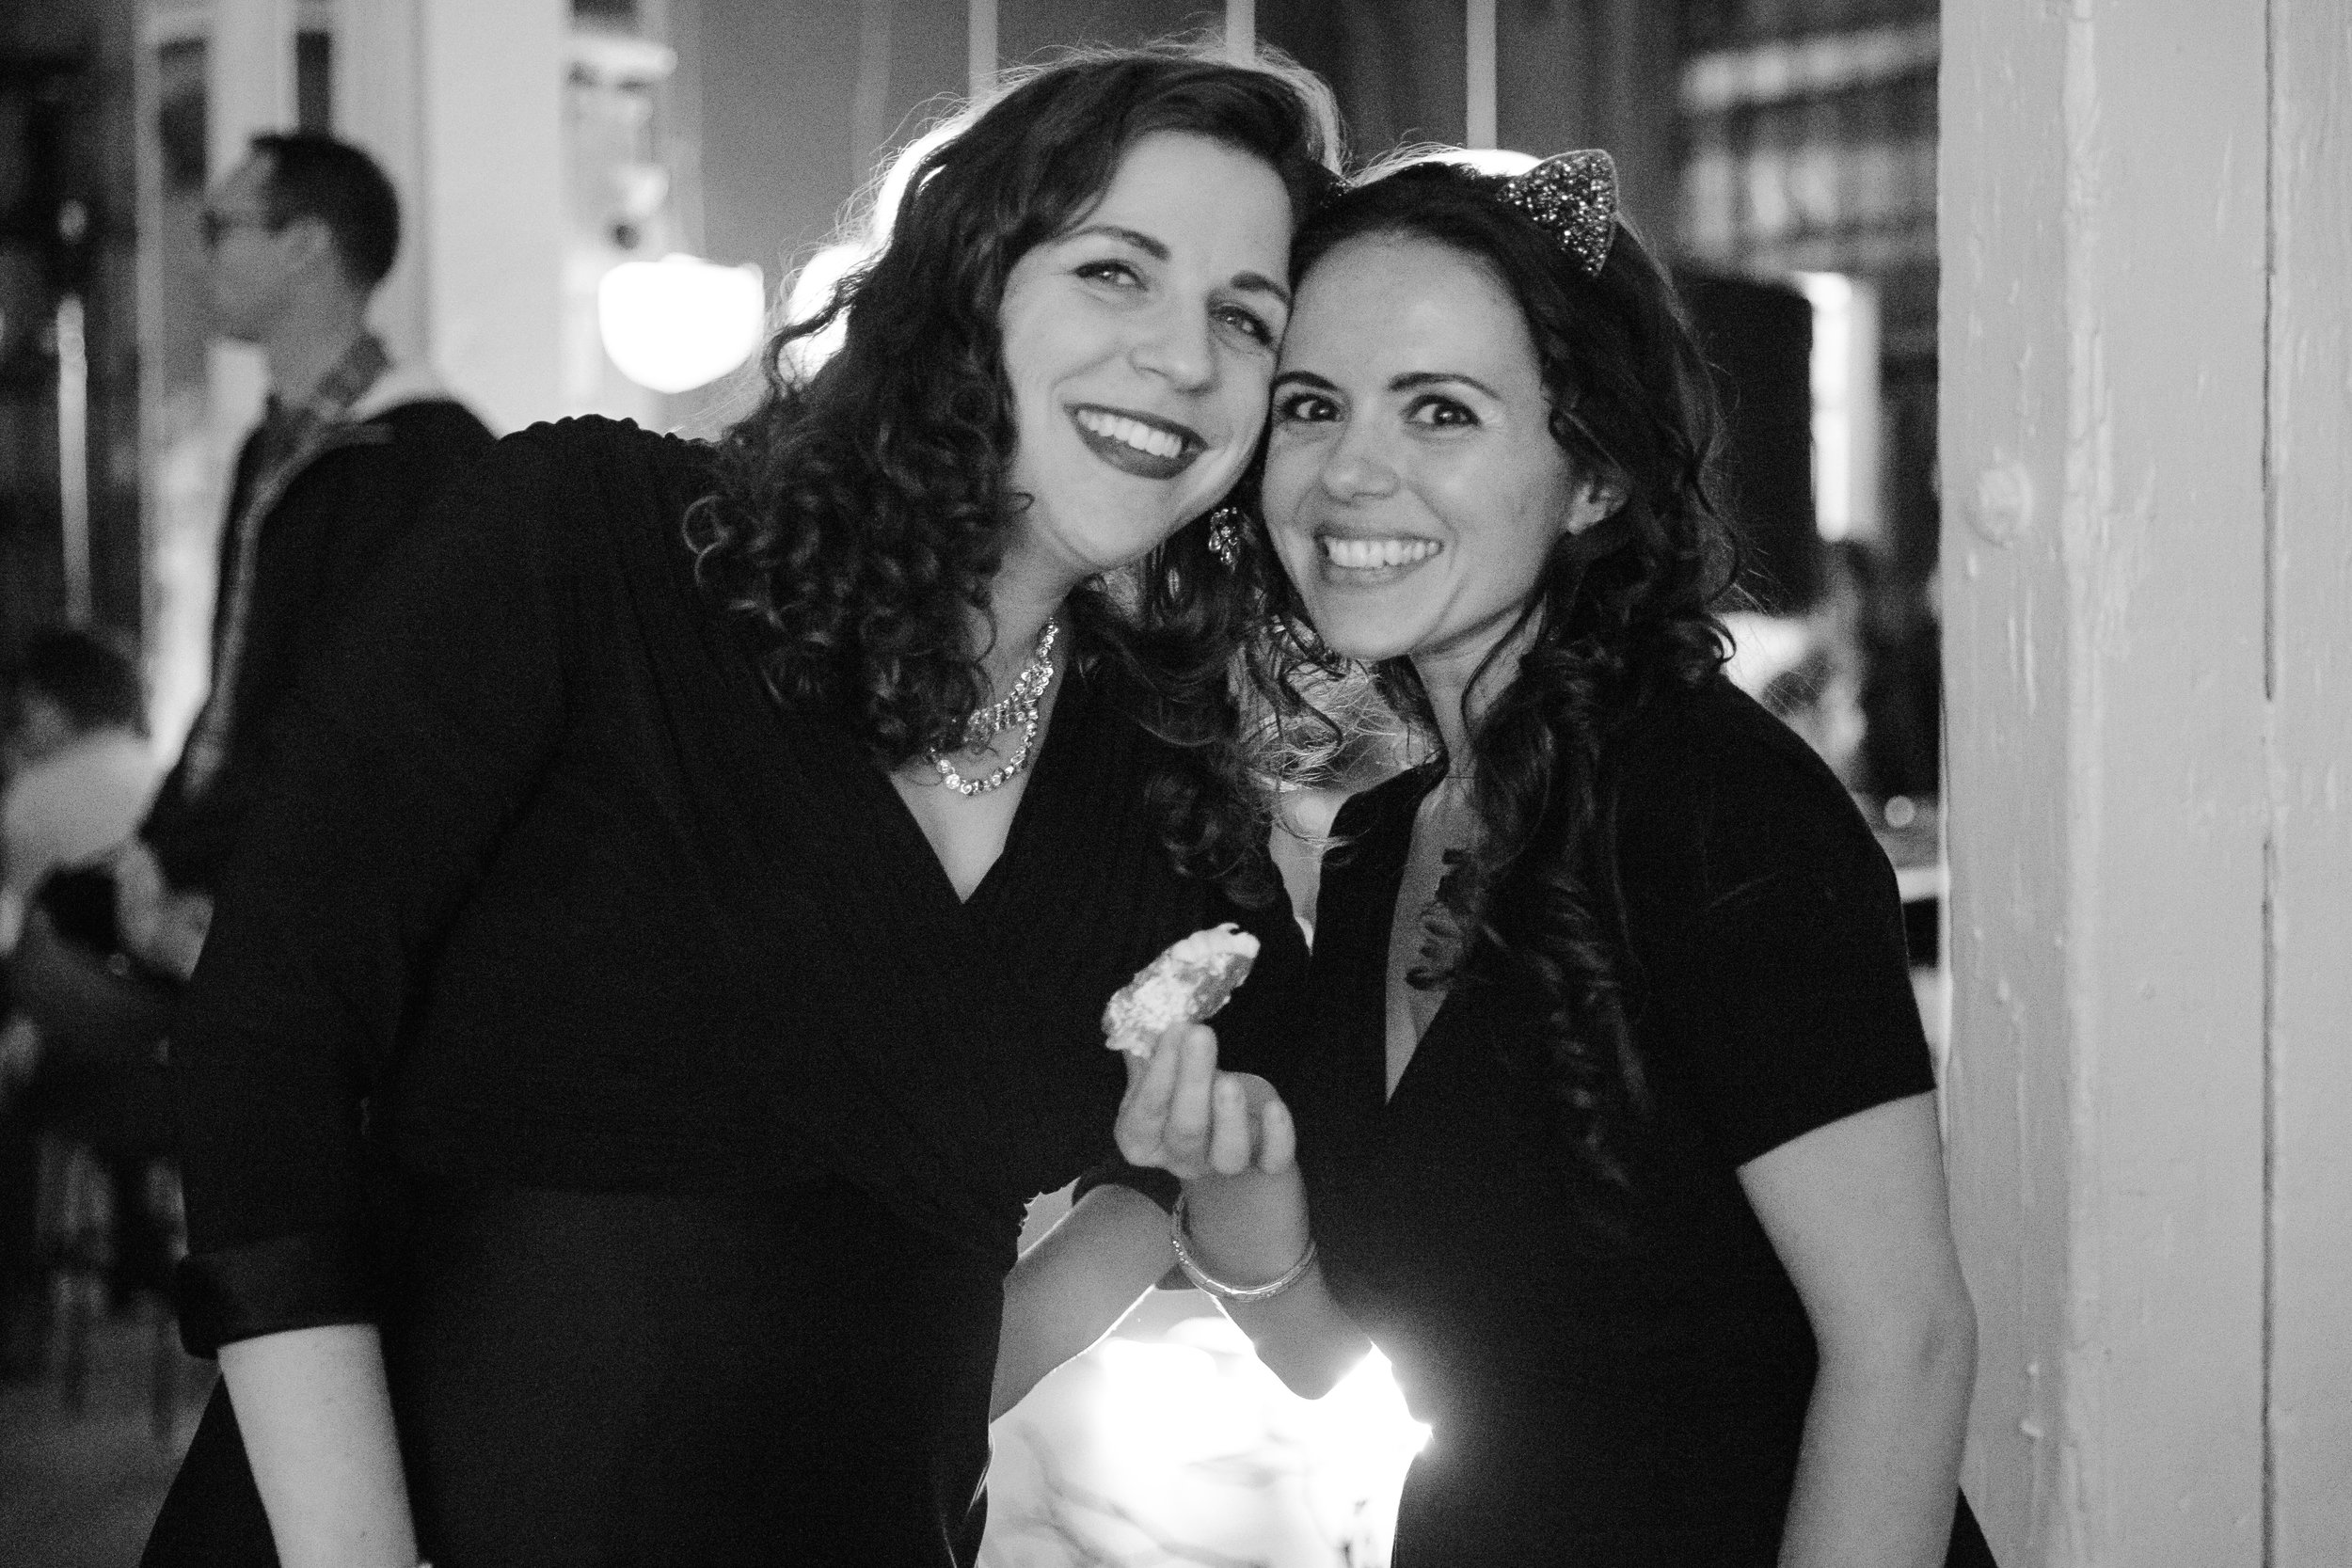 Liana with Laetitia Ruccolo, pianist and musical director of Bare Opera